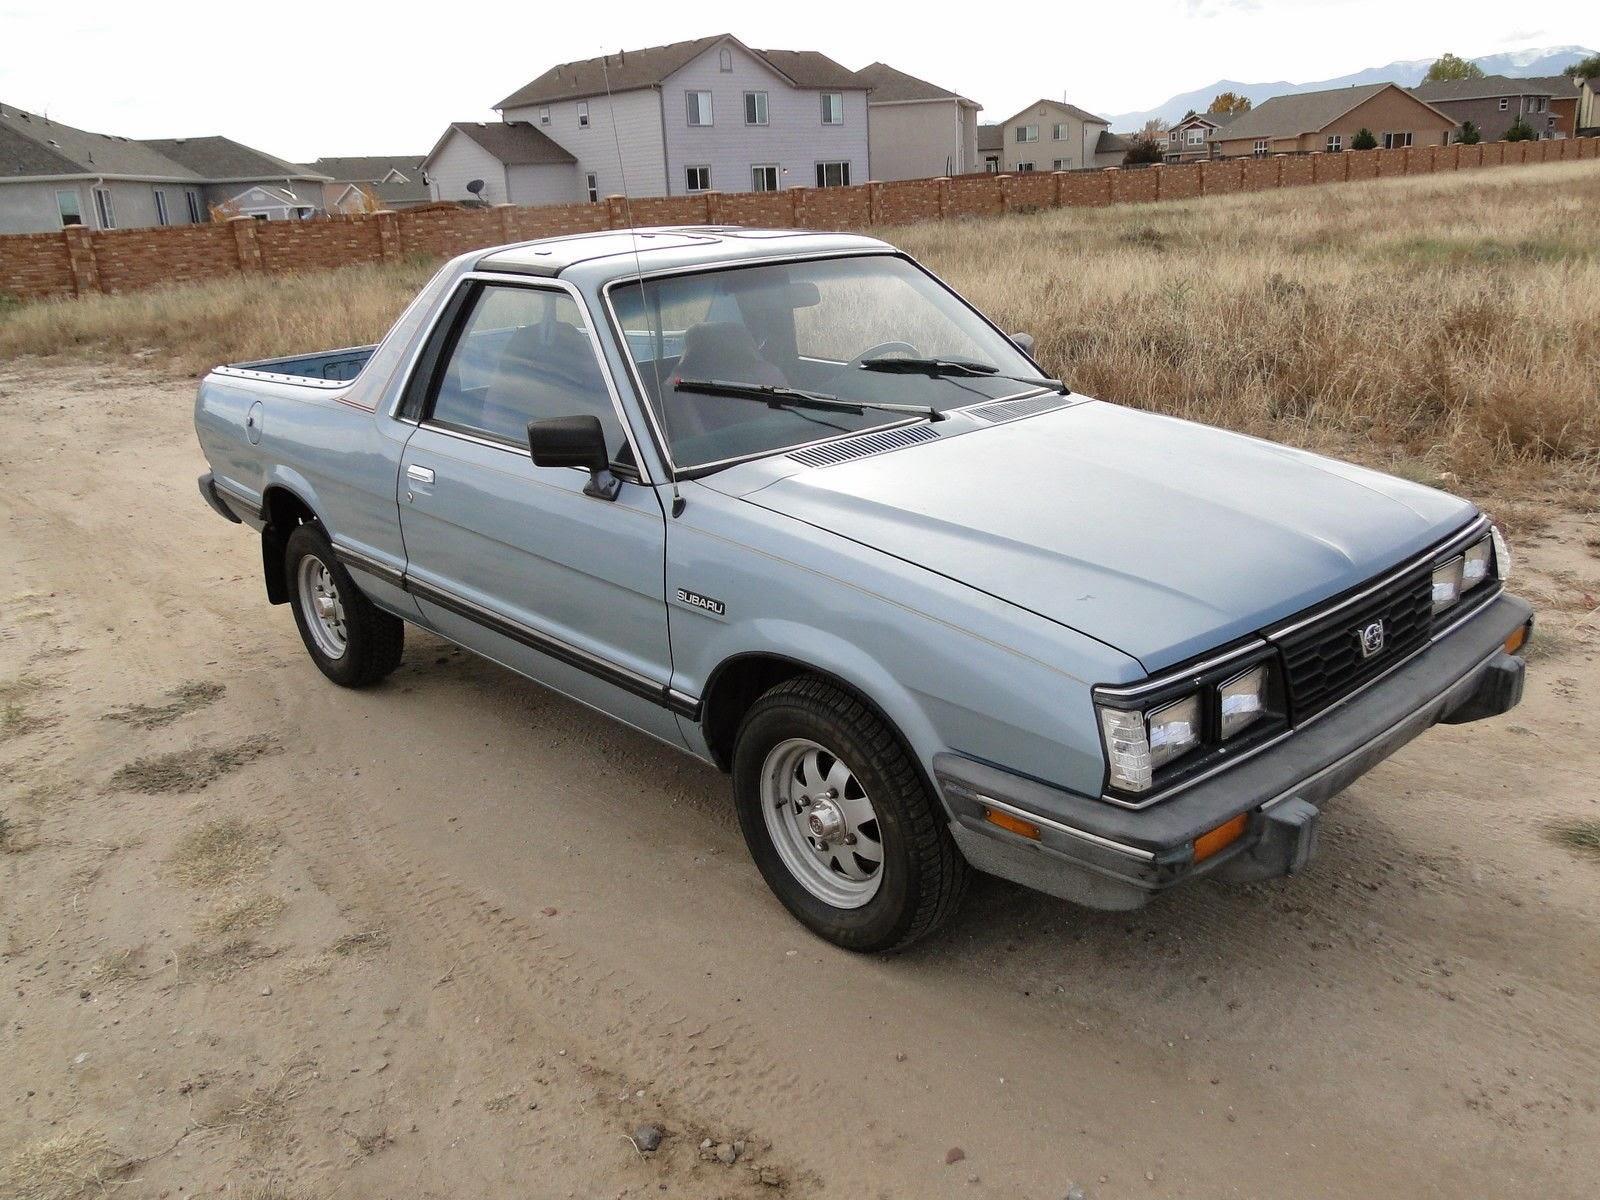 Daily Turismo 5k BRAT ATTACK 1986 Subaru BRAT